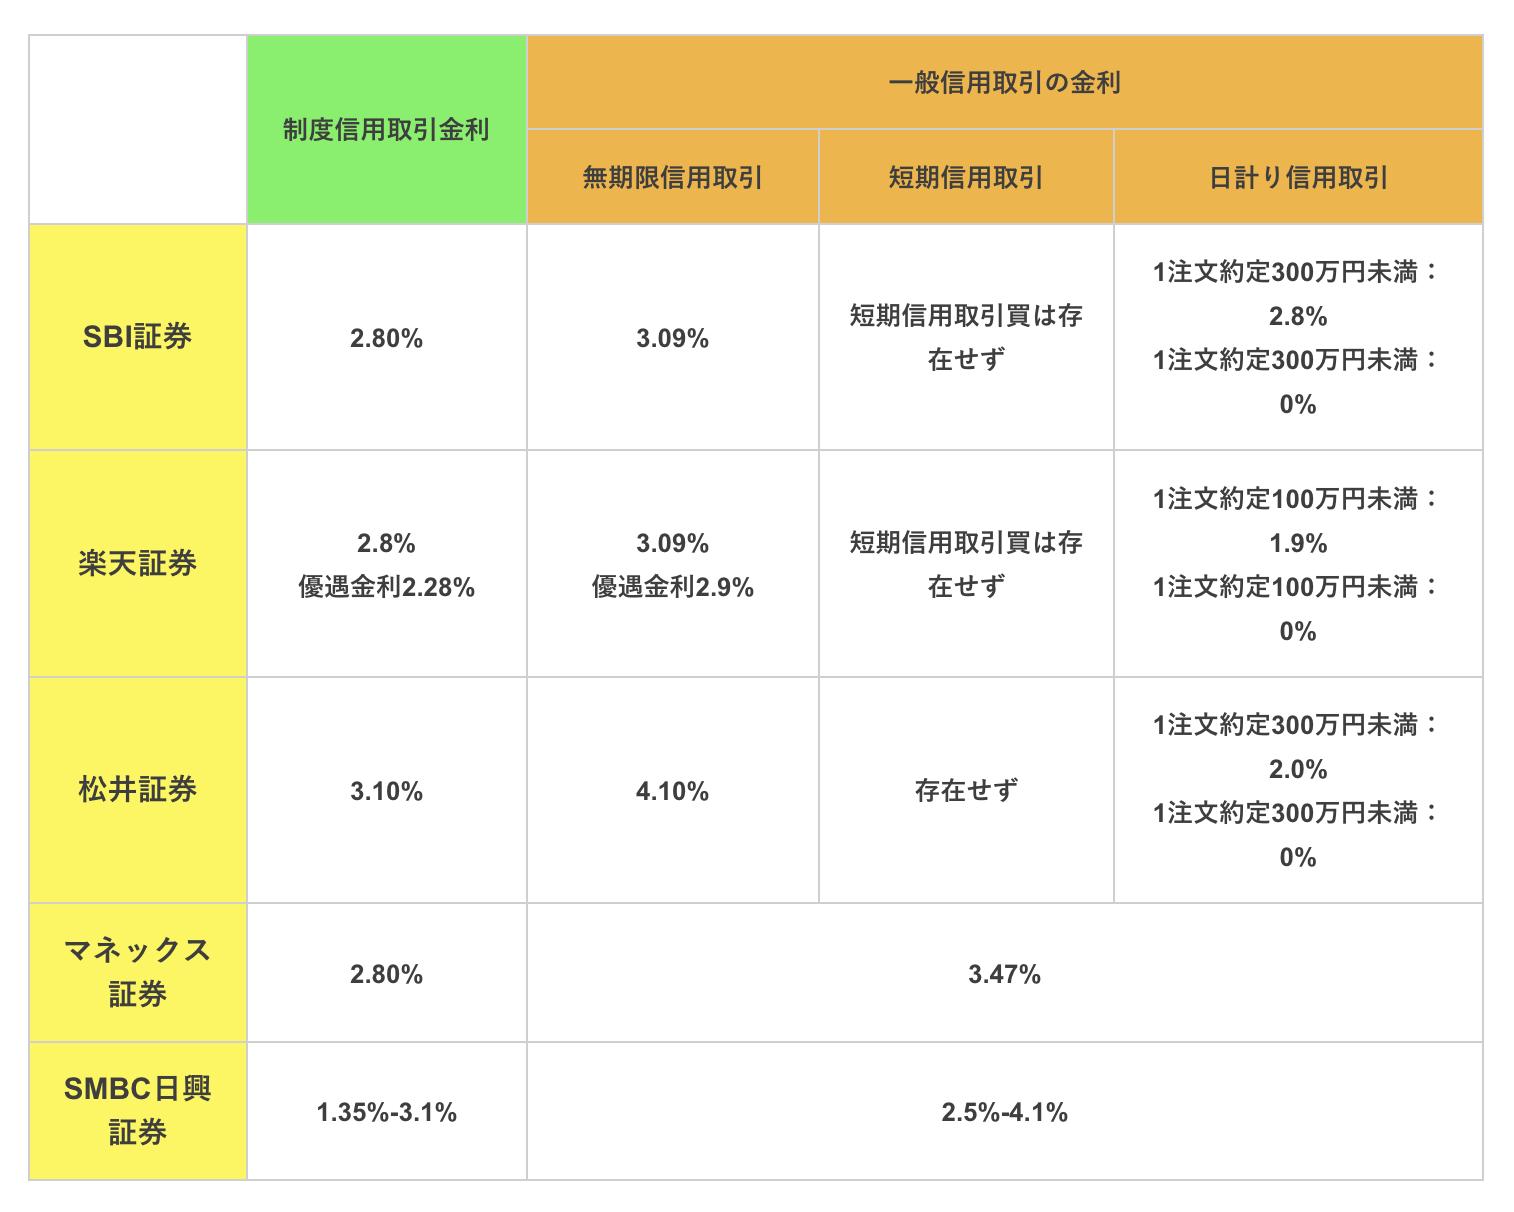 制度信用取引と一般信用取引の金利水準証券会社比較(SBI証券、楽天証券、松井証券、マネックス証券)